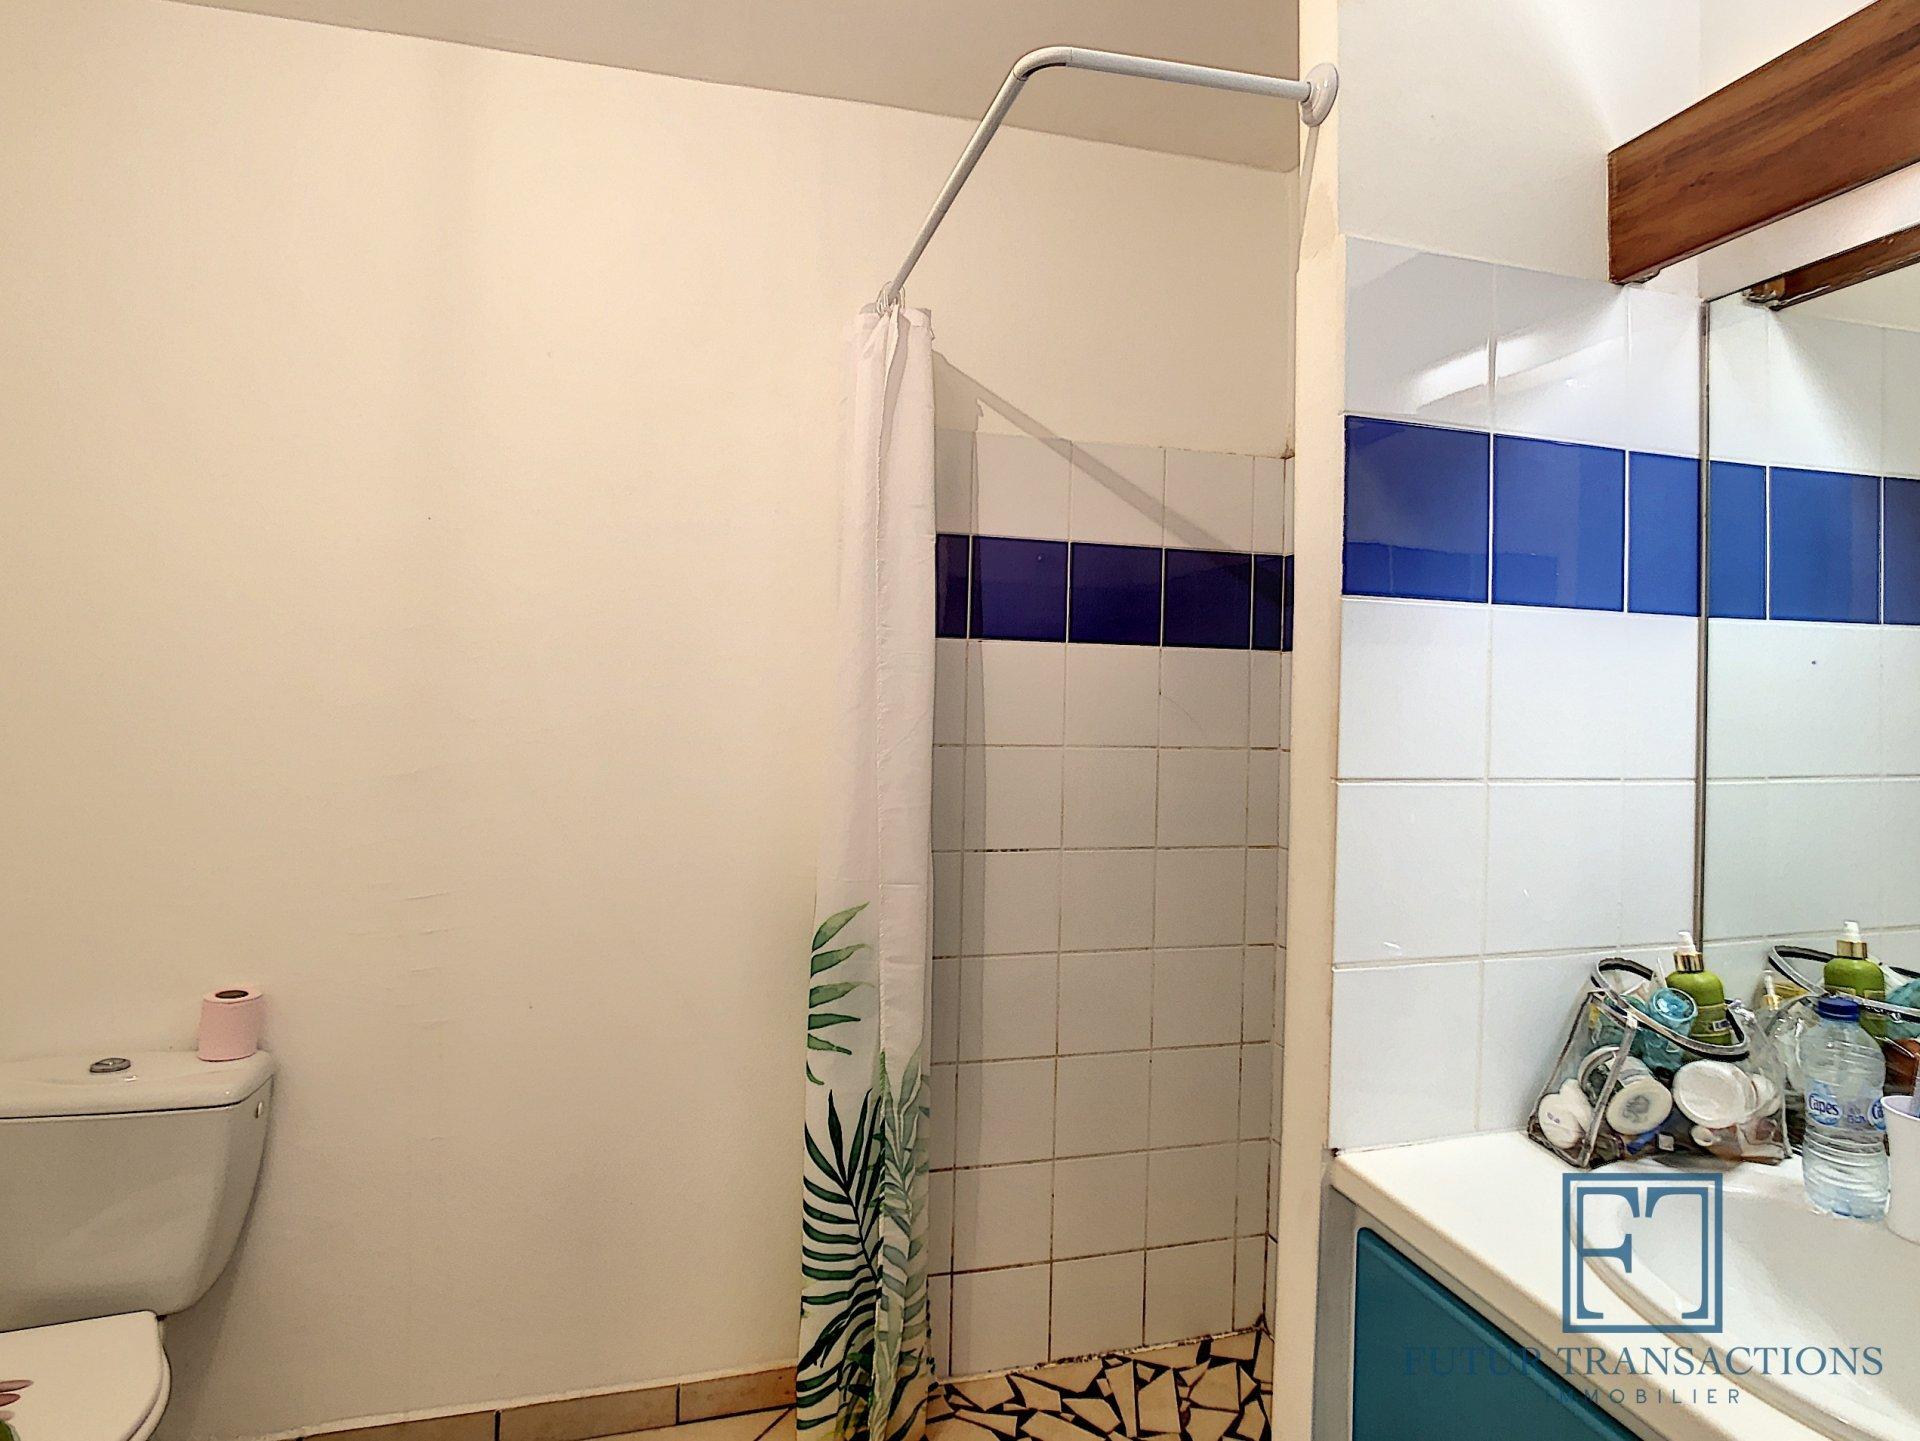 T2 résidence avec piscine Gissac